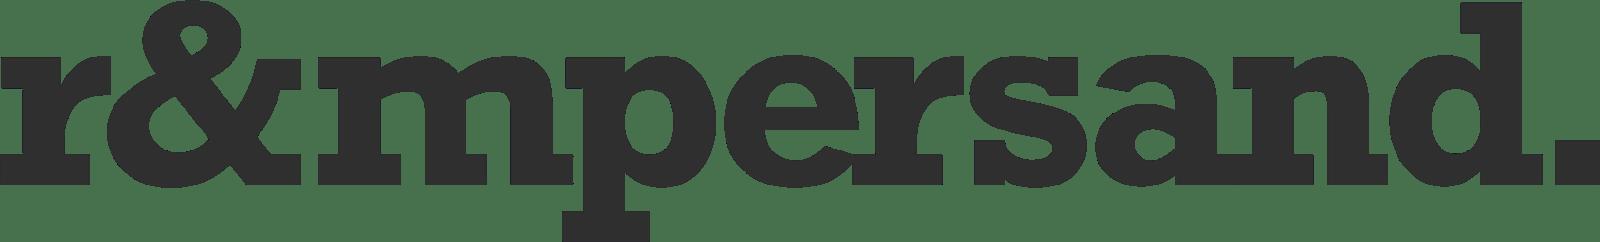 rampersand logo